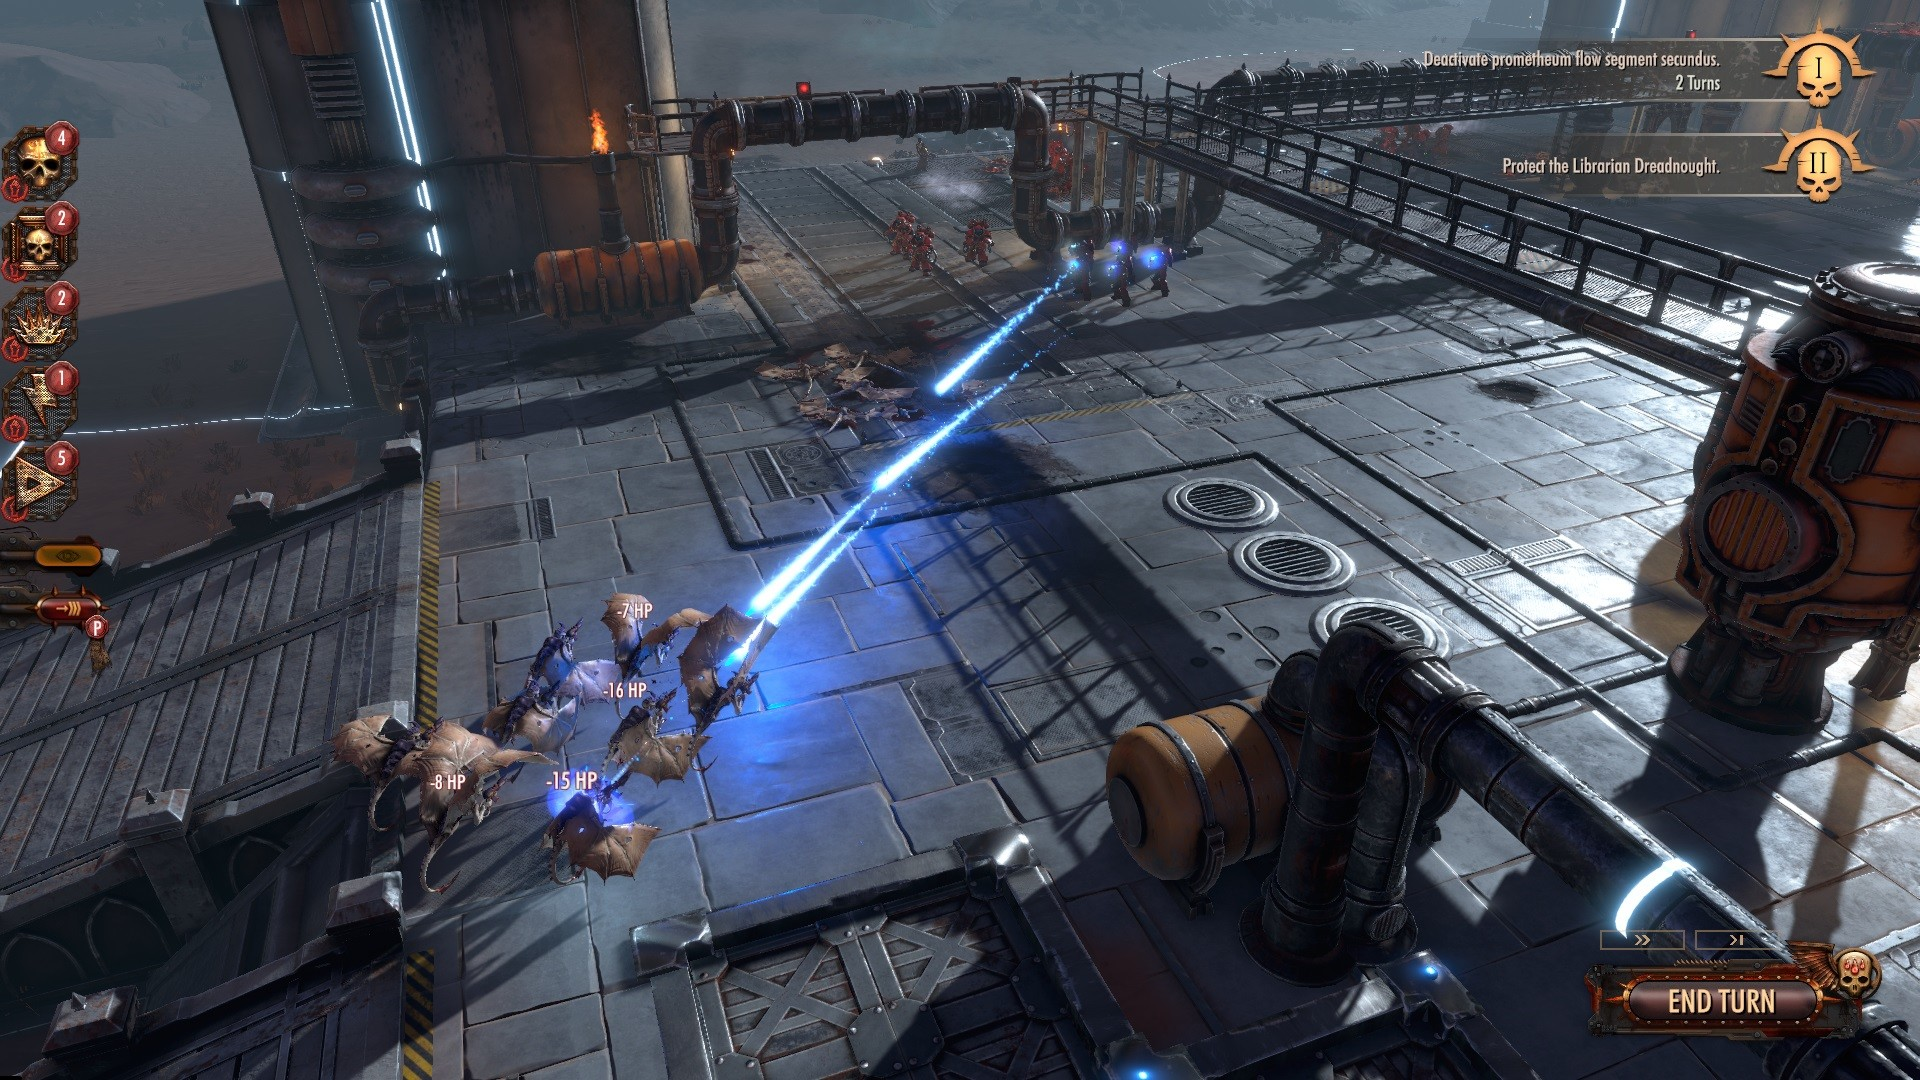 Warhammer 40,000: Battlesector PC Key Fiyatları